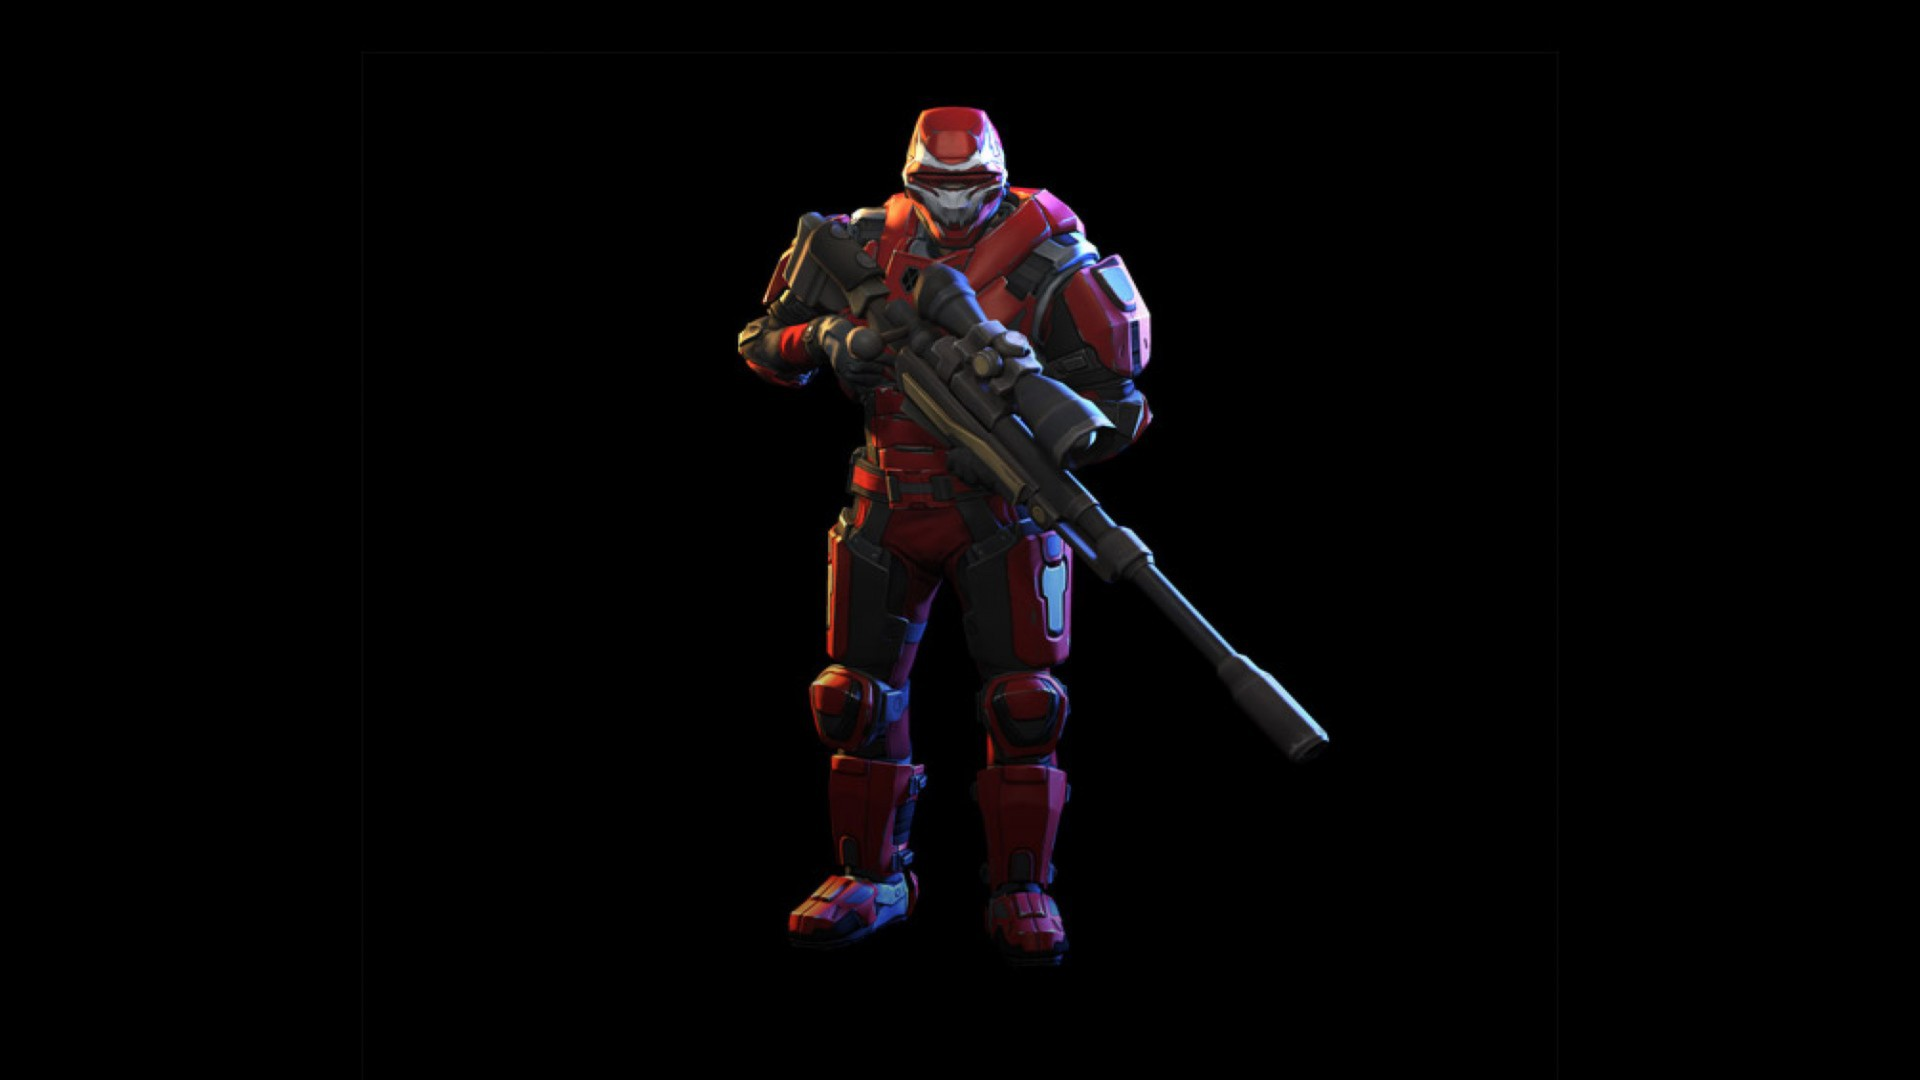 Xcom enemy unknown gets elite soldier pack dlc softpedia for Portent xcom not now